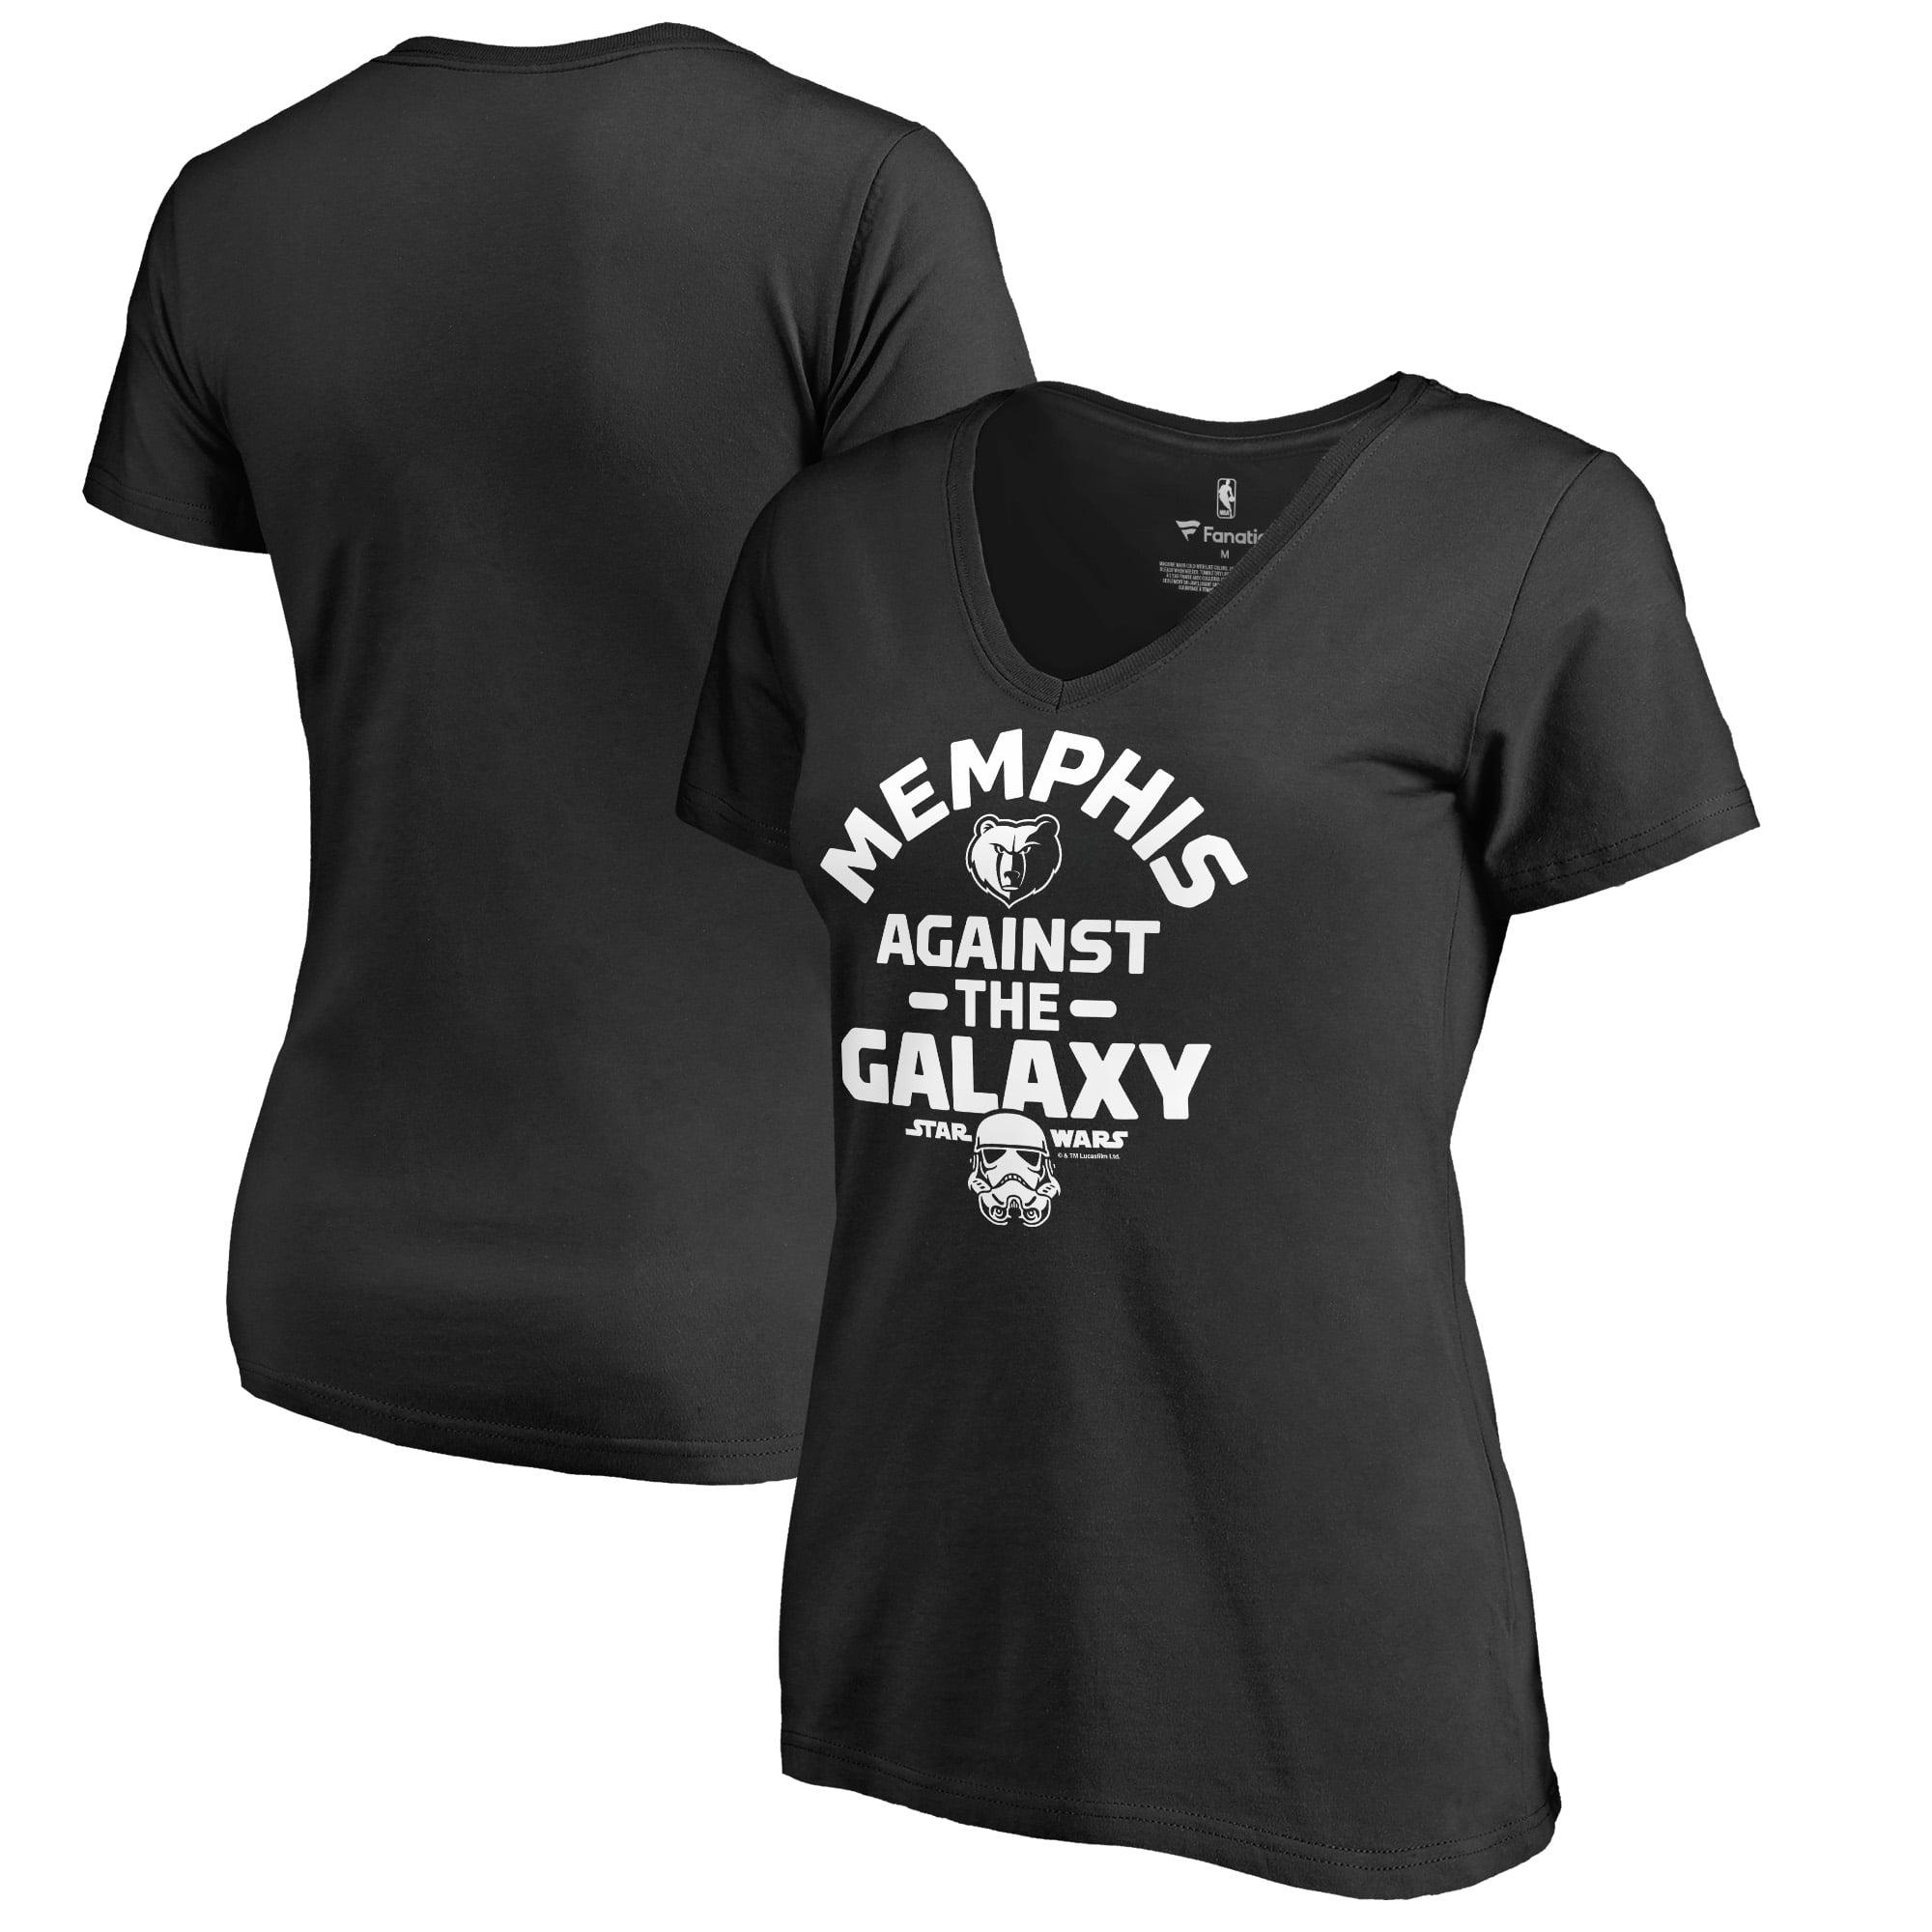 Memphis Grizzlies Fanatics Branded Women's Star Wars Against the Galaxy V-Neck T-Shirt - Black